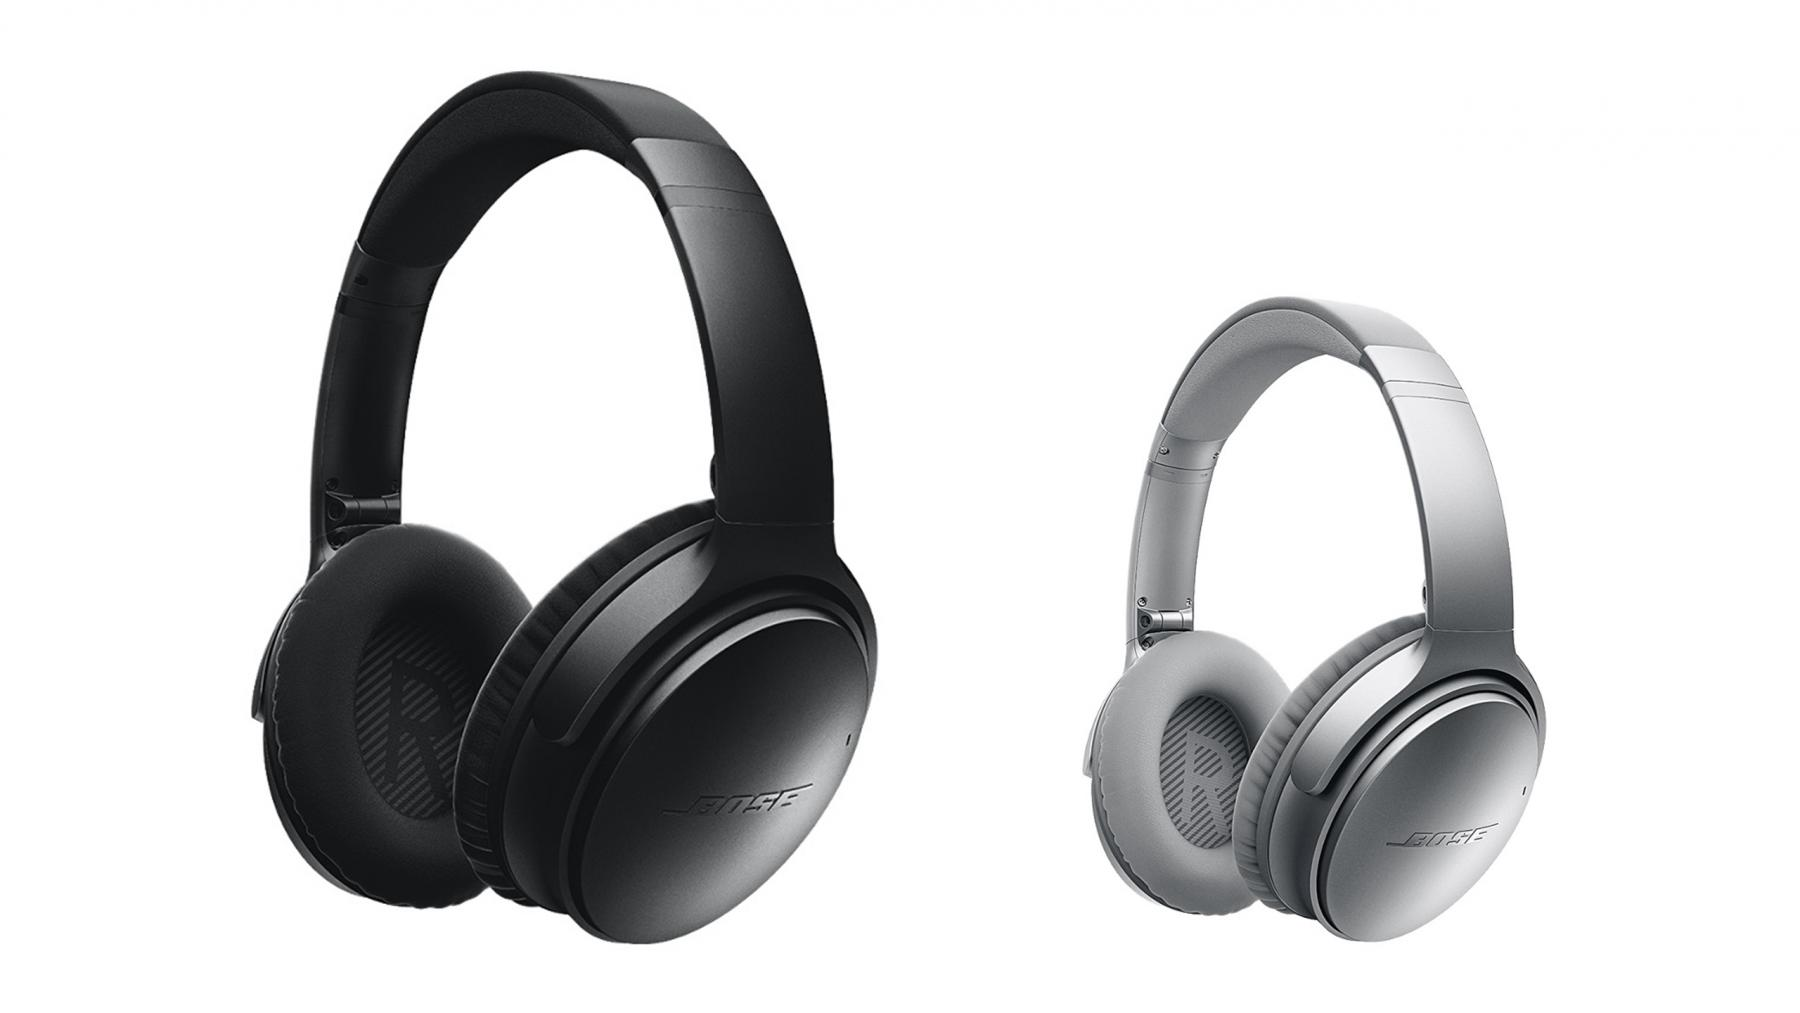 Buy Bose Quietcomfort 35 Wireless Over Ear Headphones Harvey Norman Au Qc25 Headphone For Apple Devices White